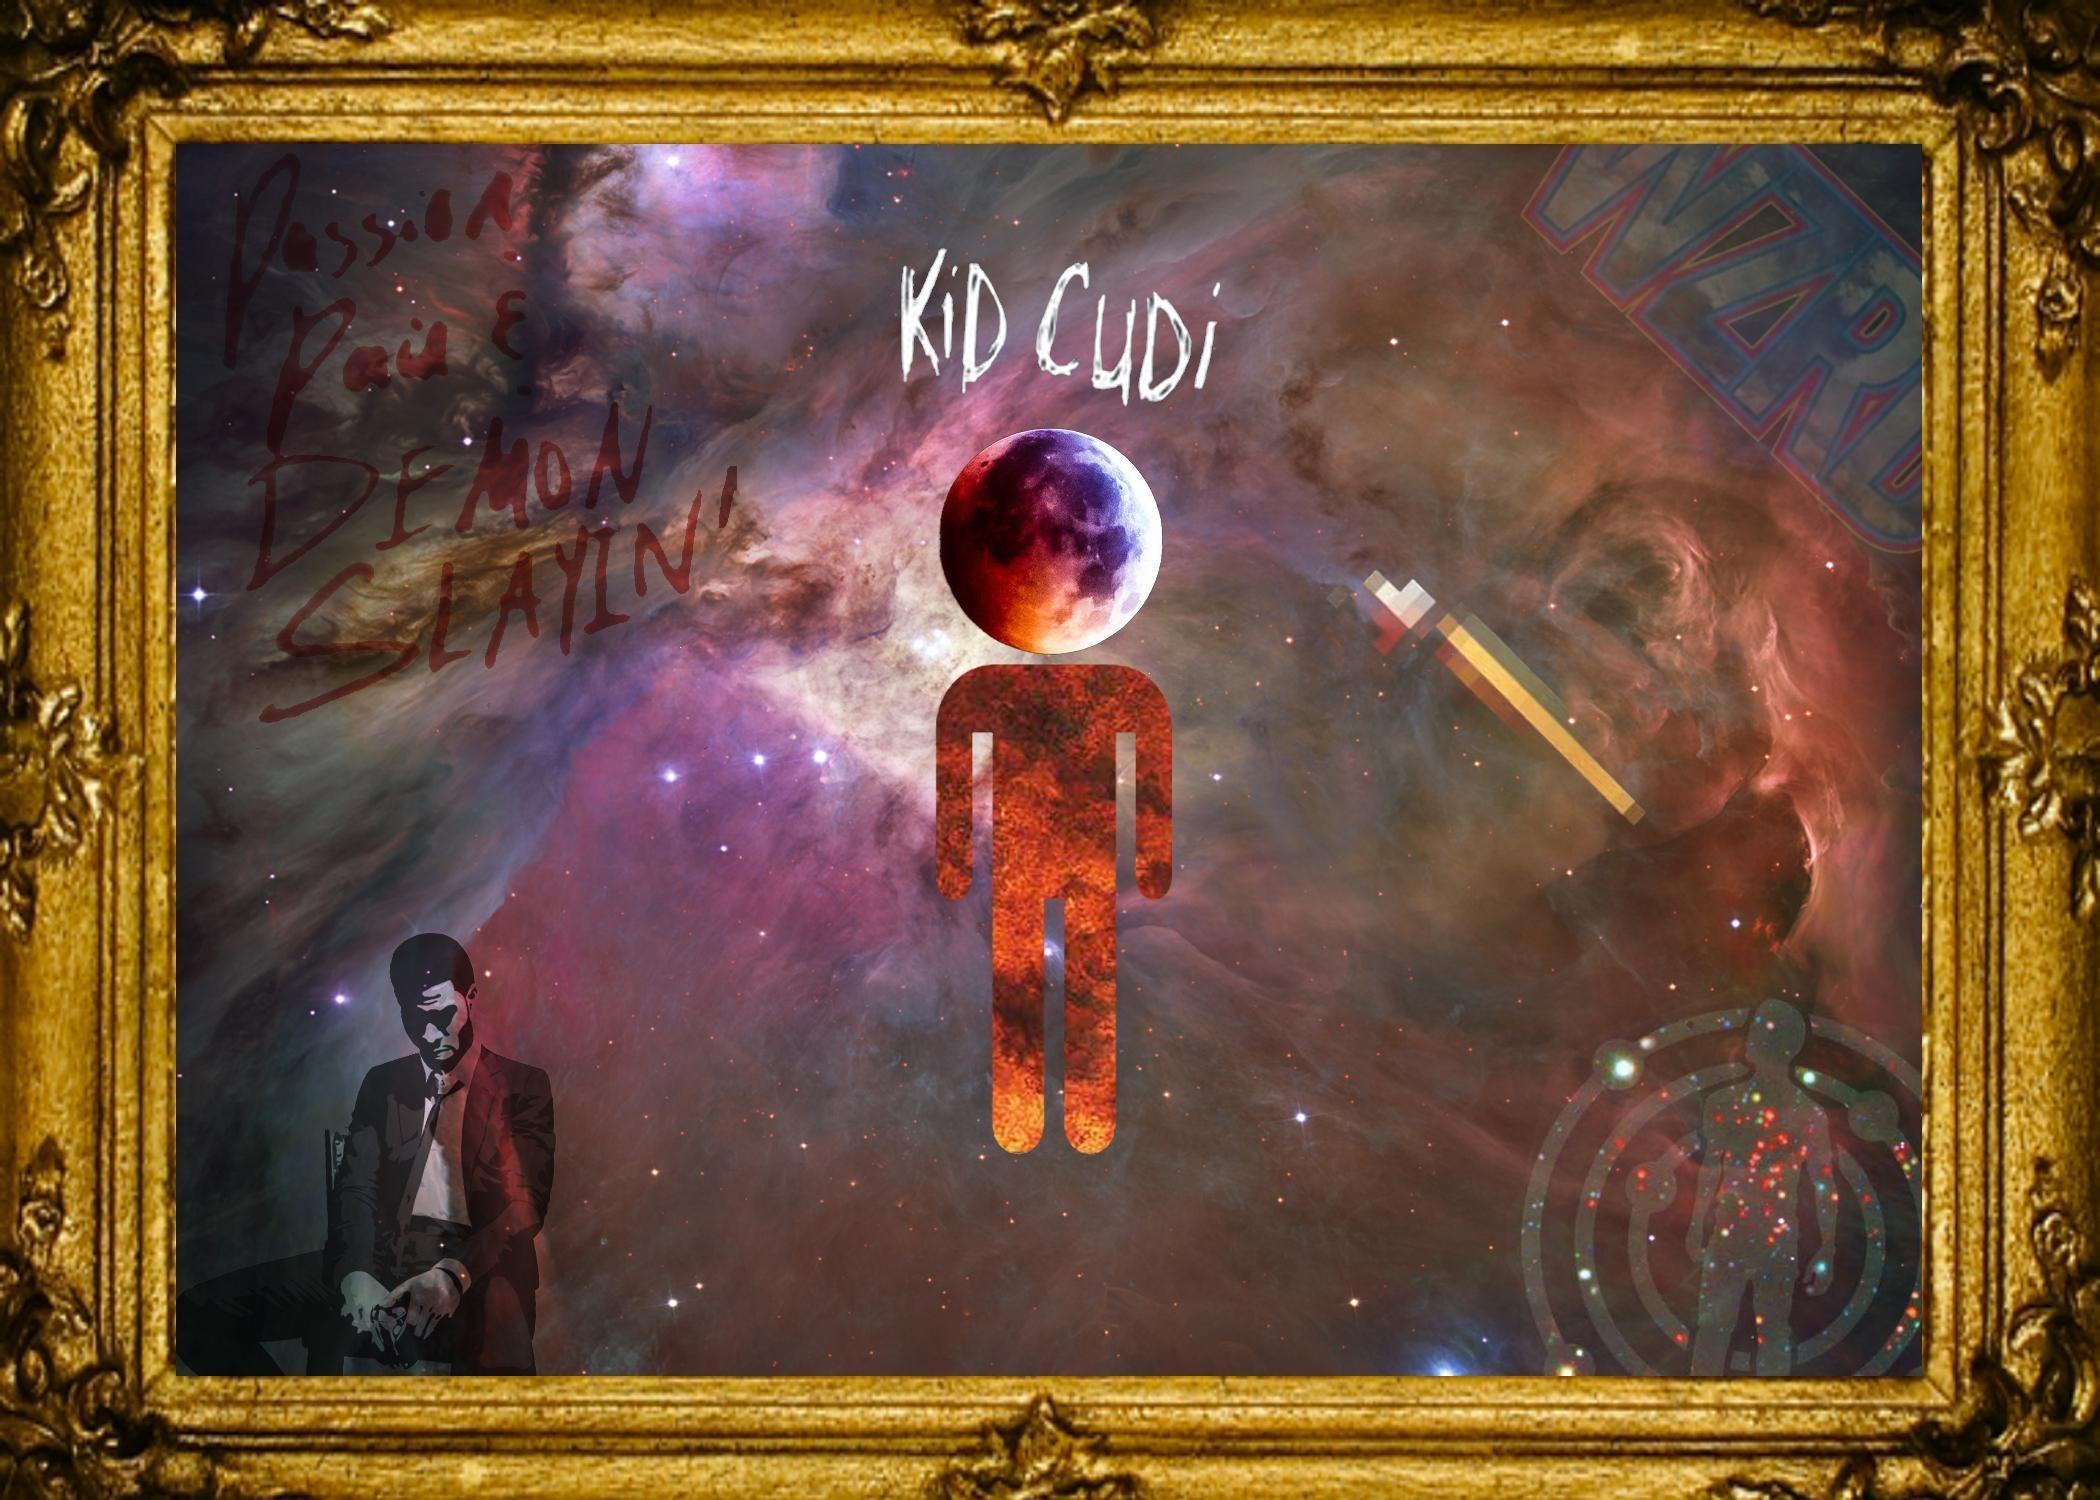 Kid Cudi Iphone Plus Wallpaper Kid Cudi Wallpaper Kid Cudi Wallpaper Kid Cudi Wallpaper